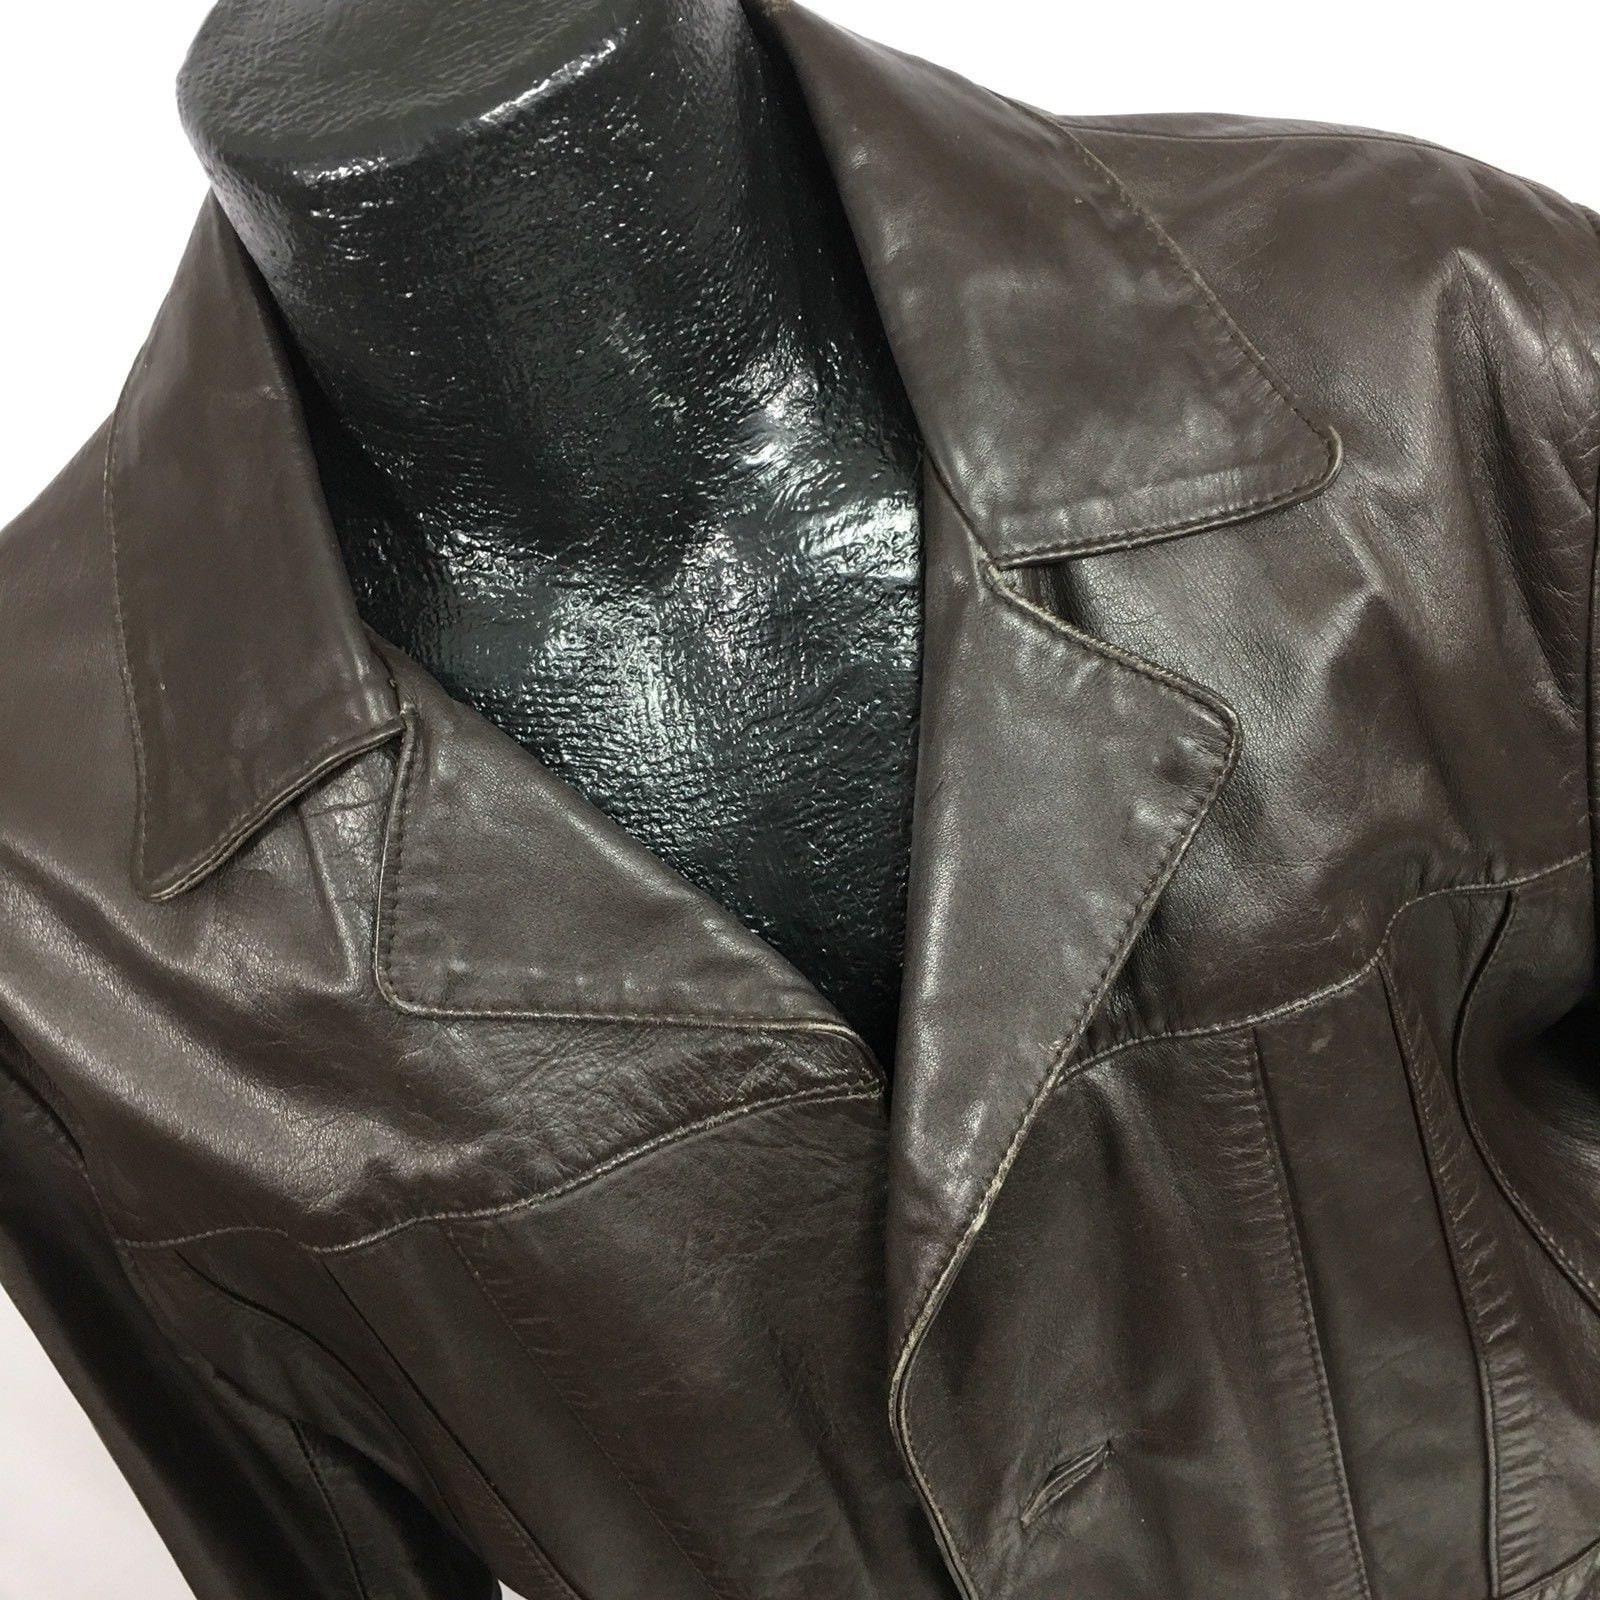 1960s – 70s Men's Ties | Skinny Ties, Slim Ties Vintage 1960-70s Campus Mens Brown Mod Sport Coat 3 Button Belted Back Leather Spy Jacket 44 $119.00 AT vintagedancer.com